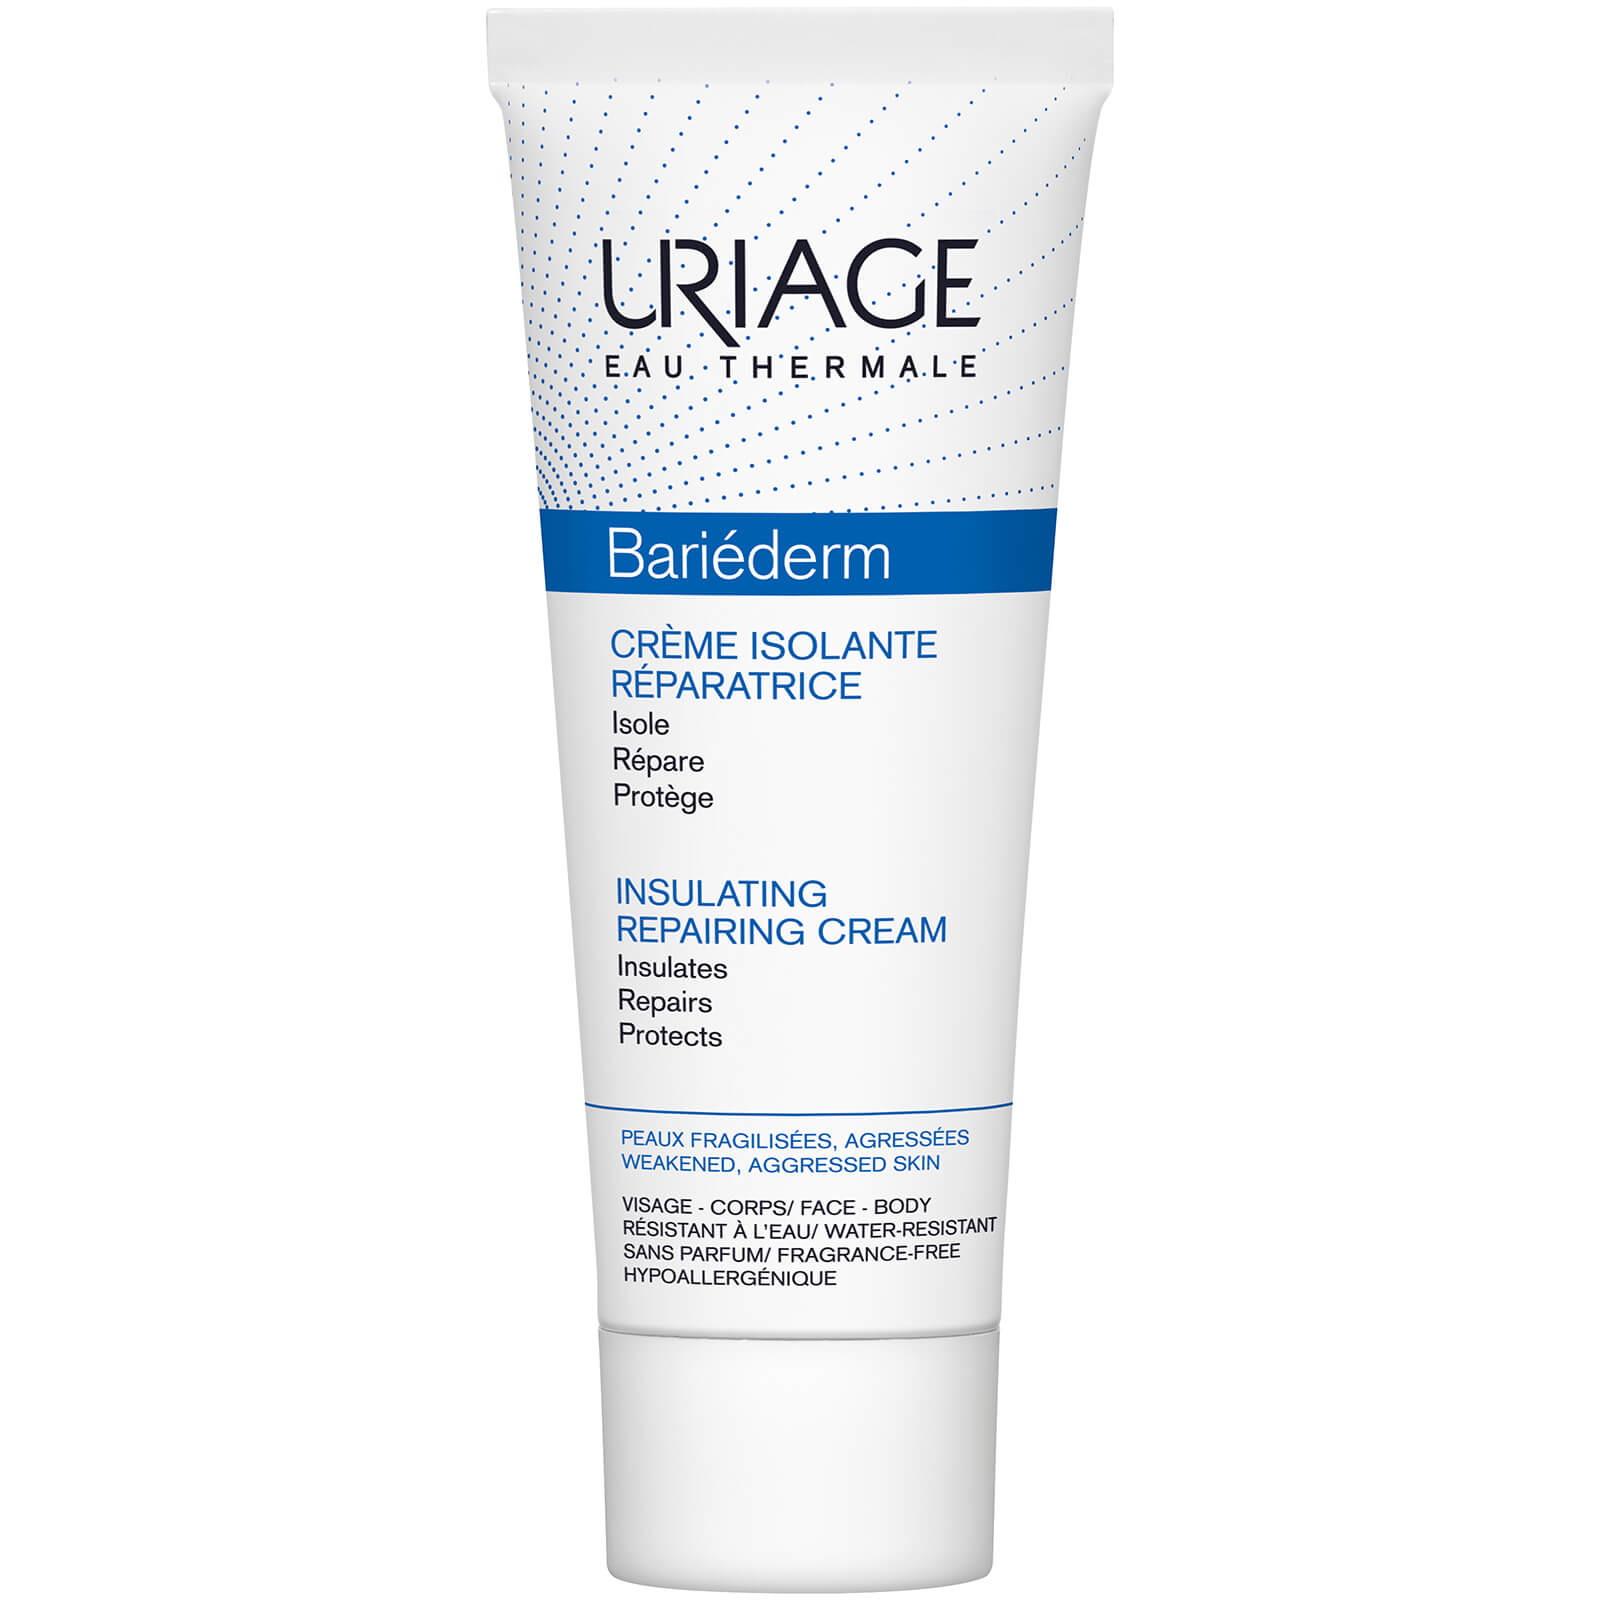 Image of Uriage Bariéderm Insulating Repairing Cream 75ml